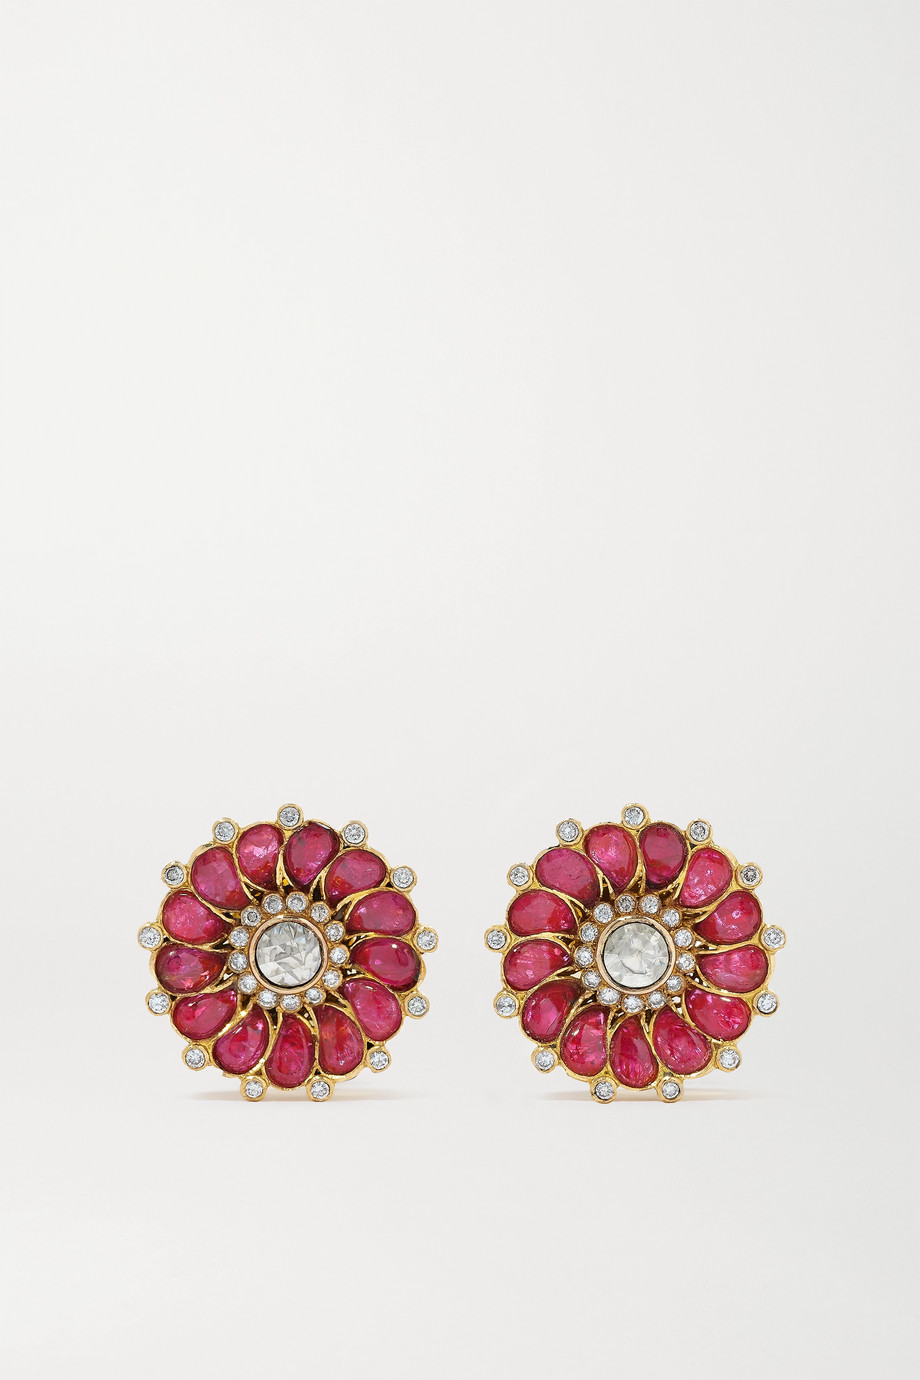 Amrapali 18-karat gold, ruby and diamond earrings